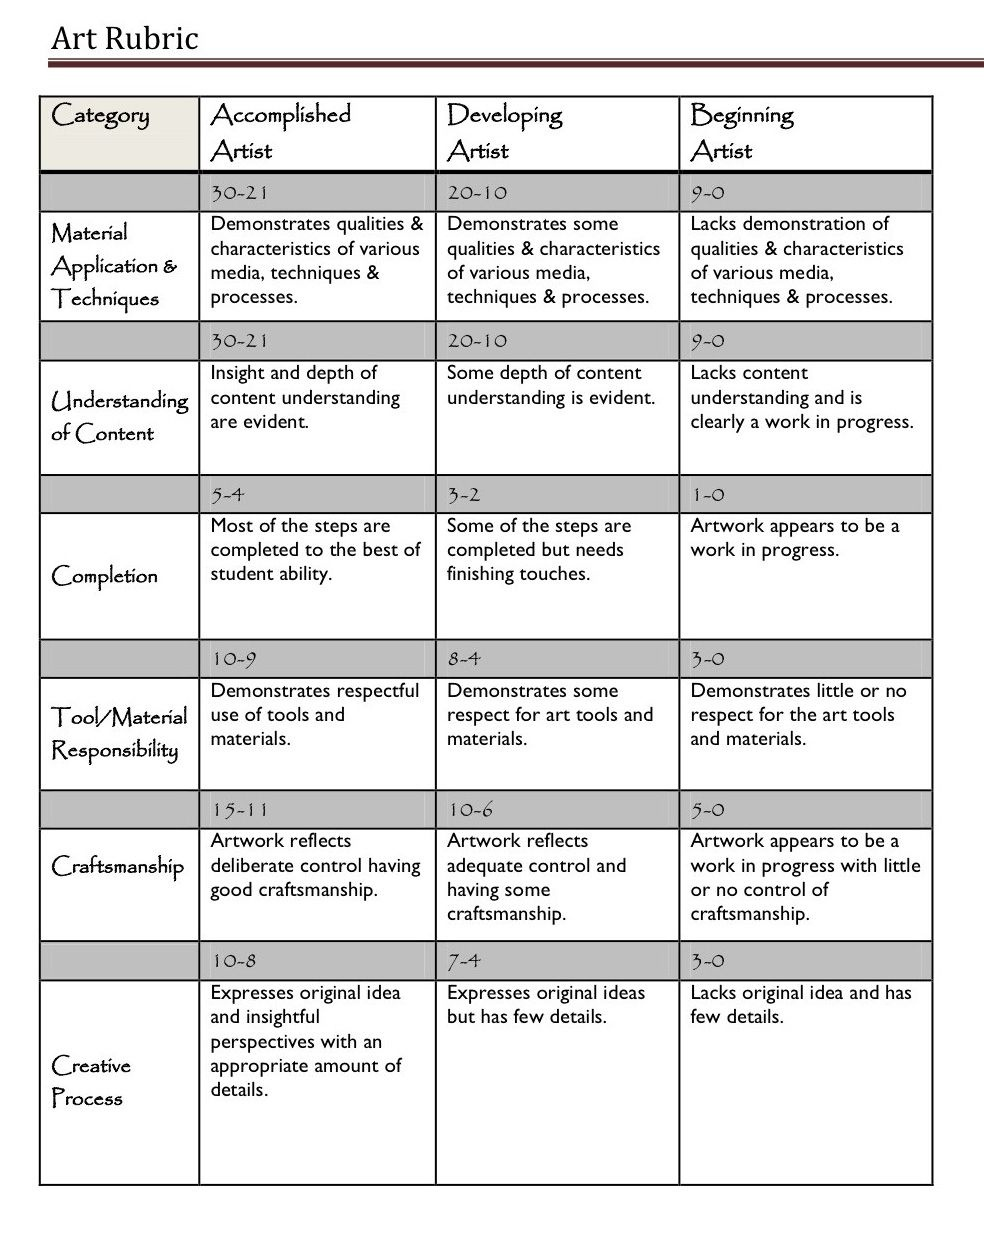 A Handy Rubric For Art Teachers   Assessment Tools & Ideas   Art - Free Printable Art Rubrics